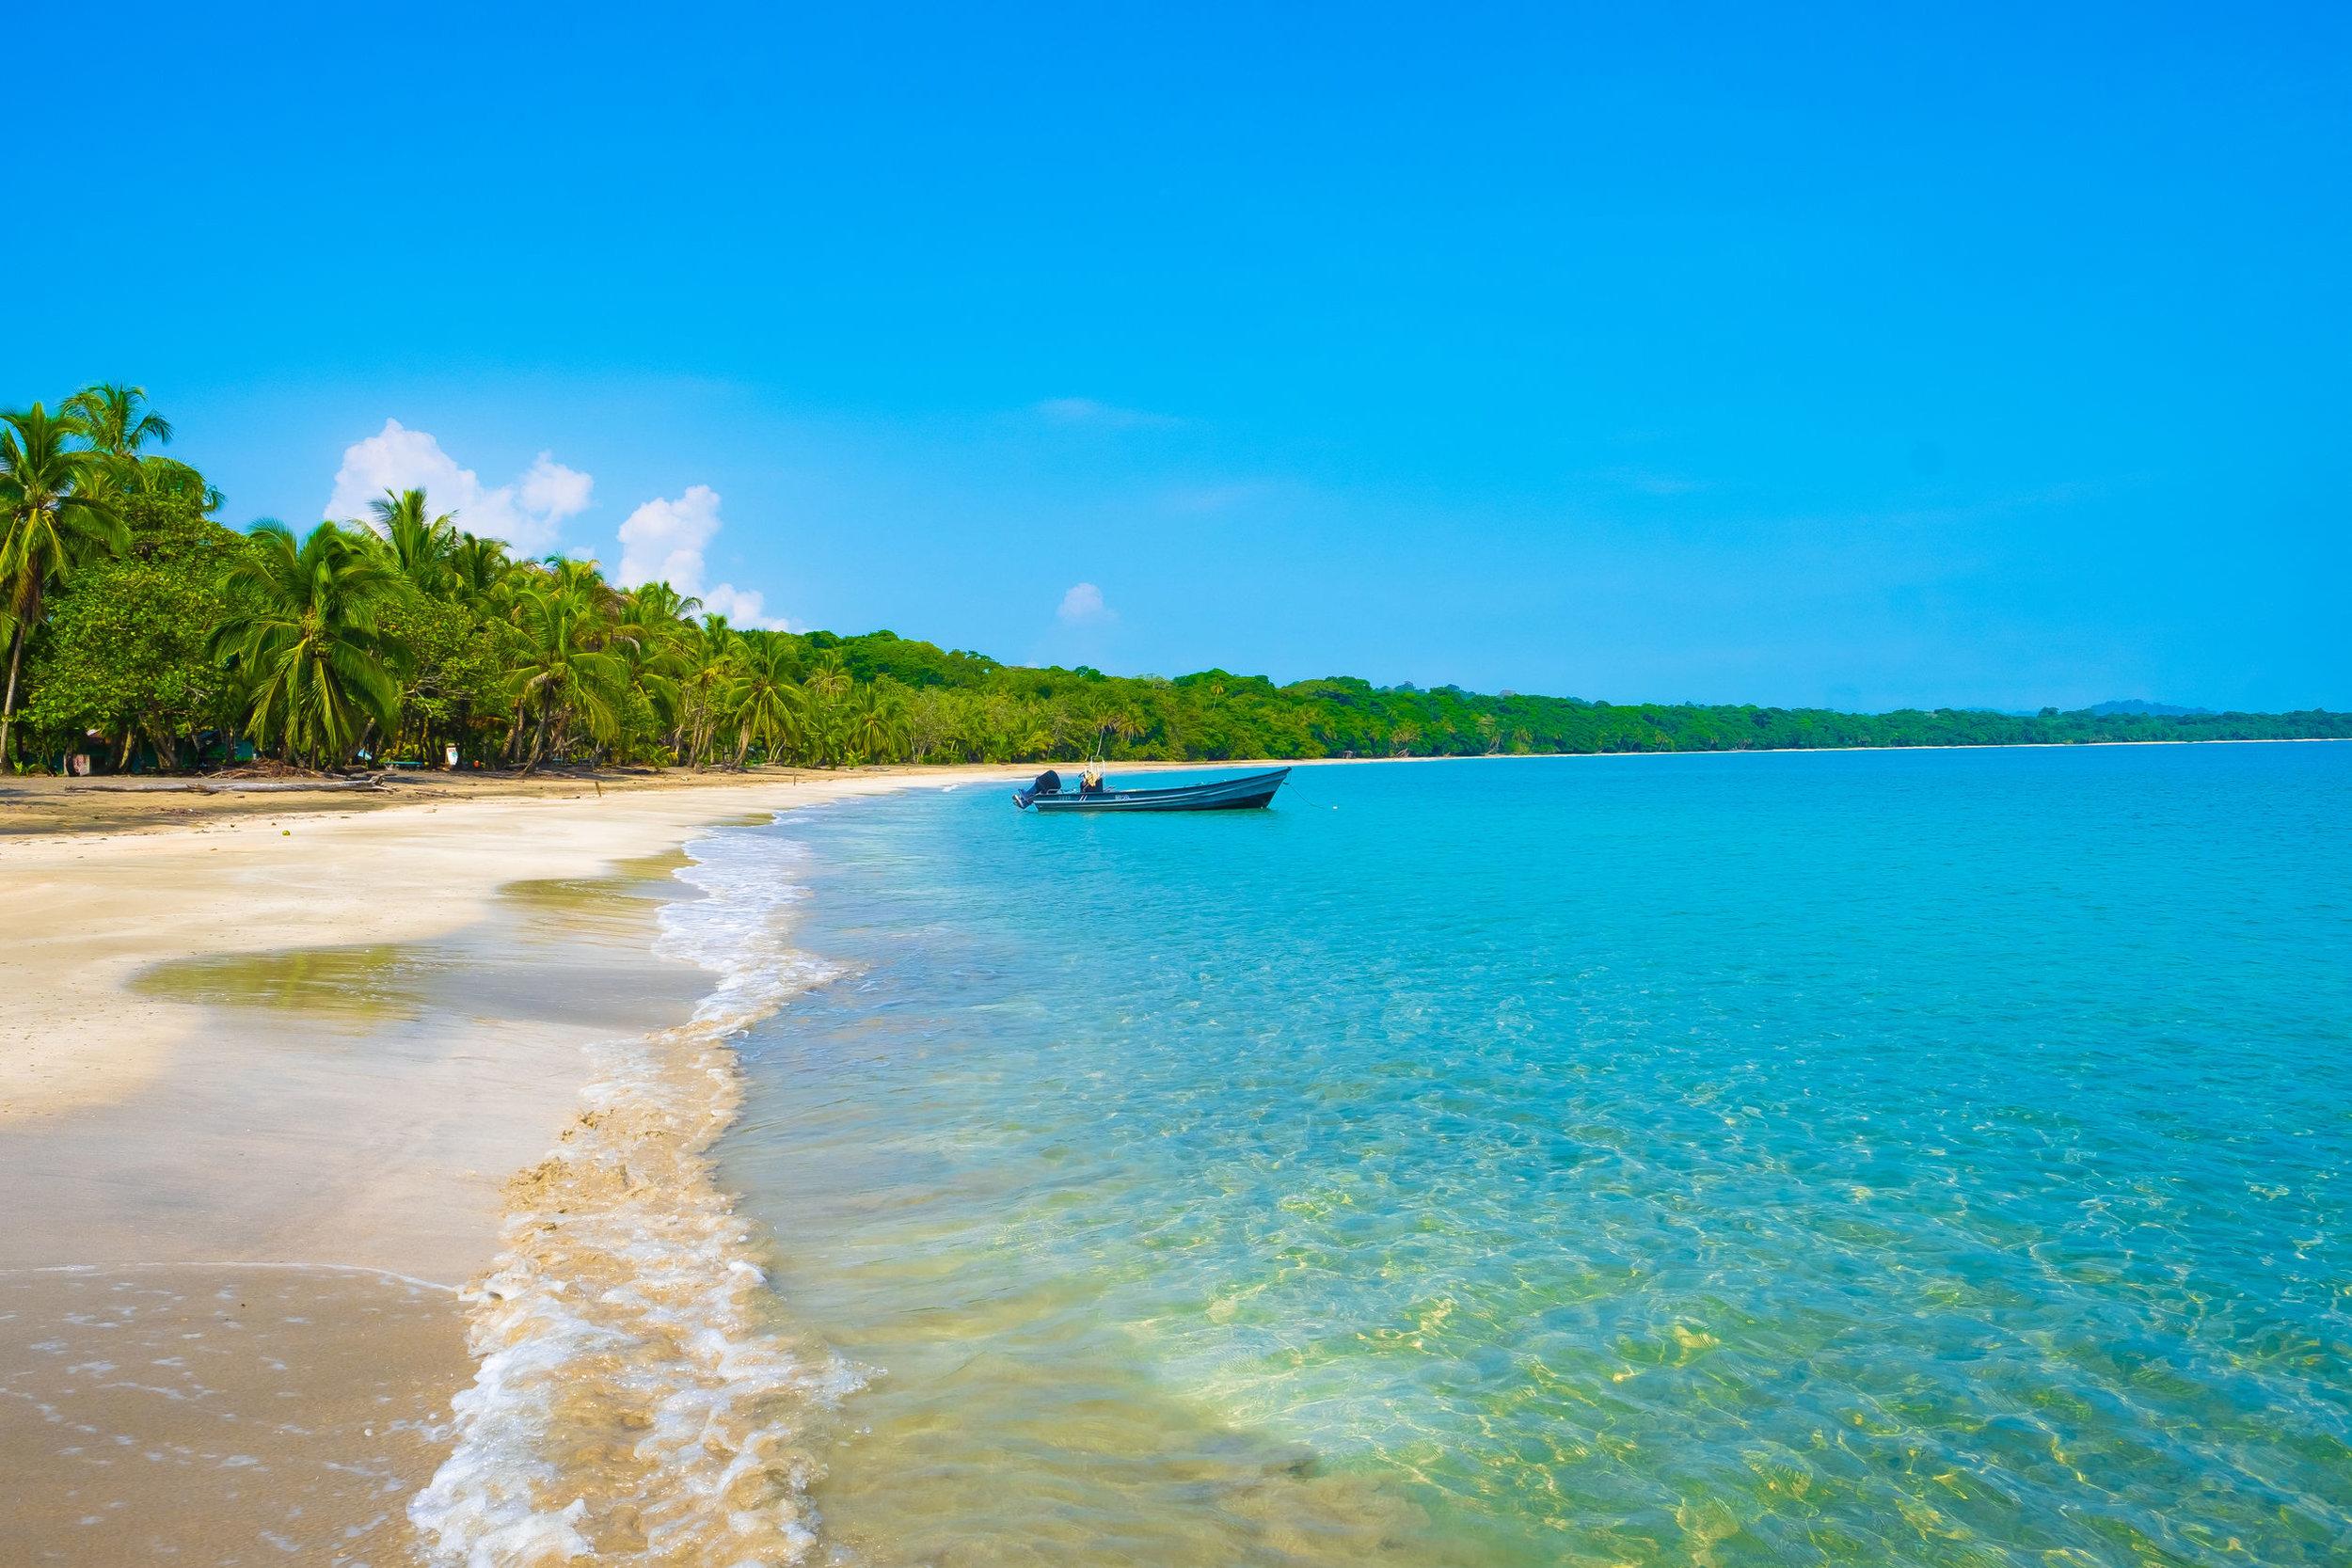 costa-rica-puerto-viejo-beach-1.jpg